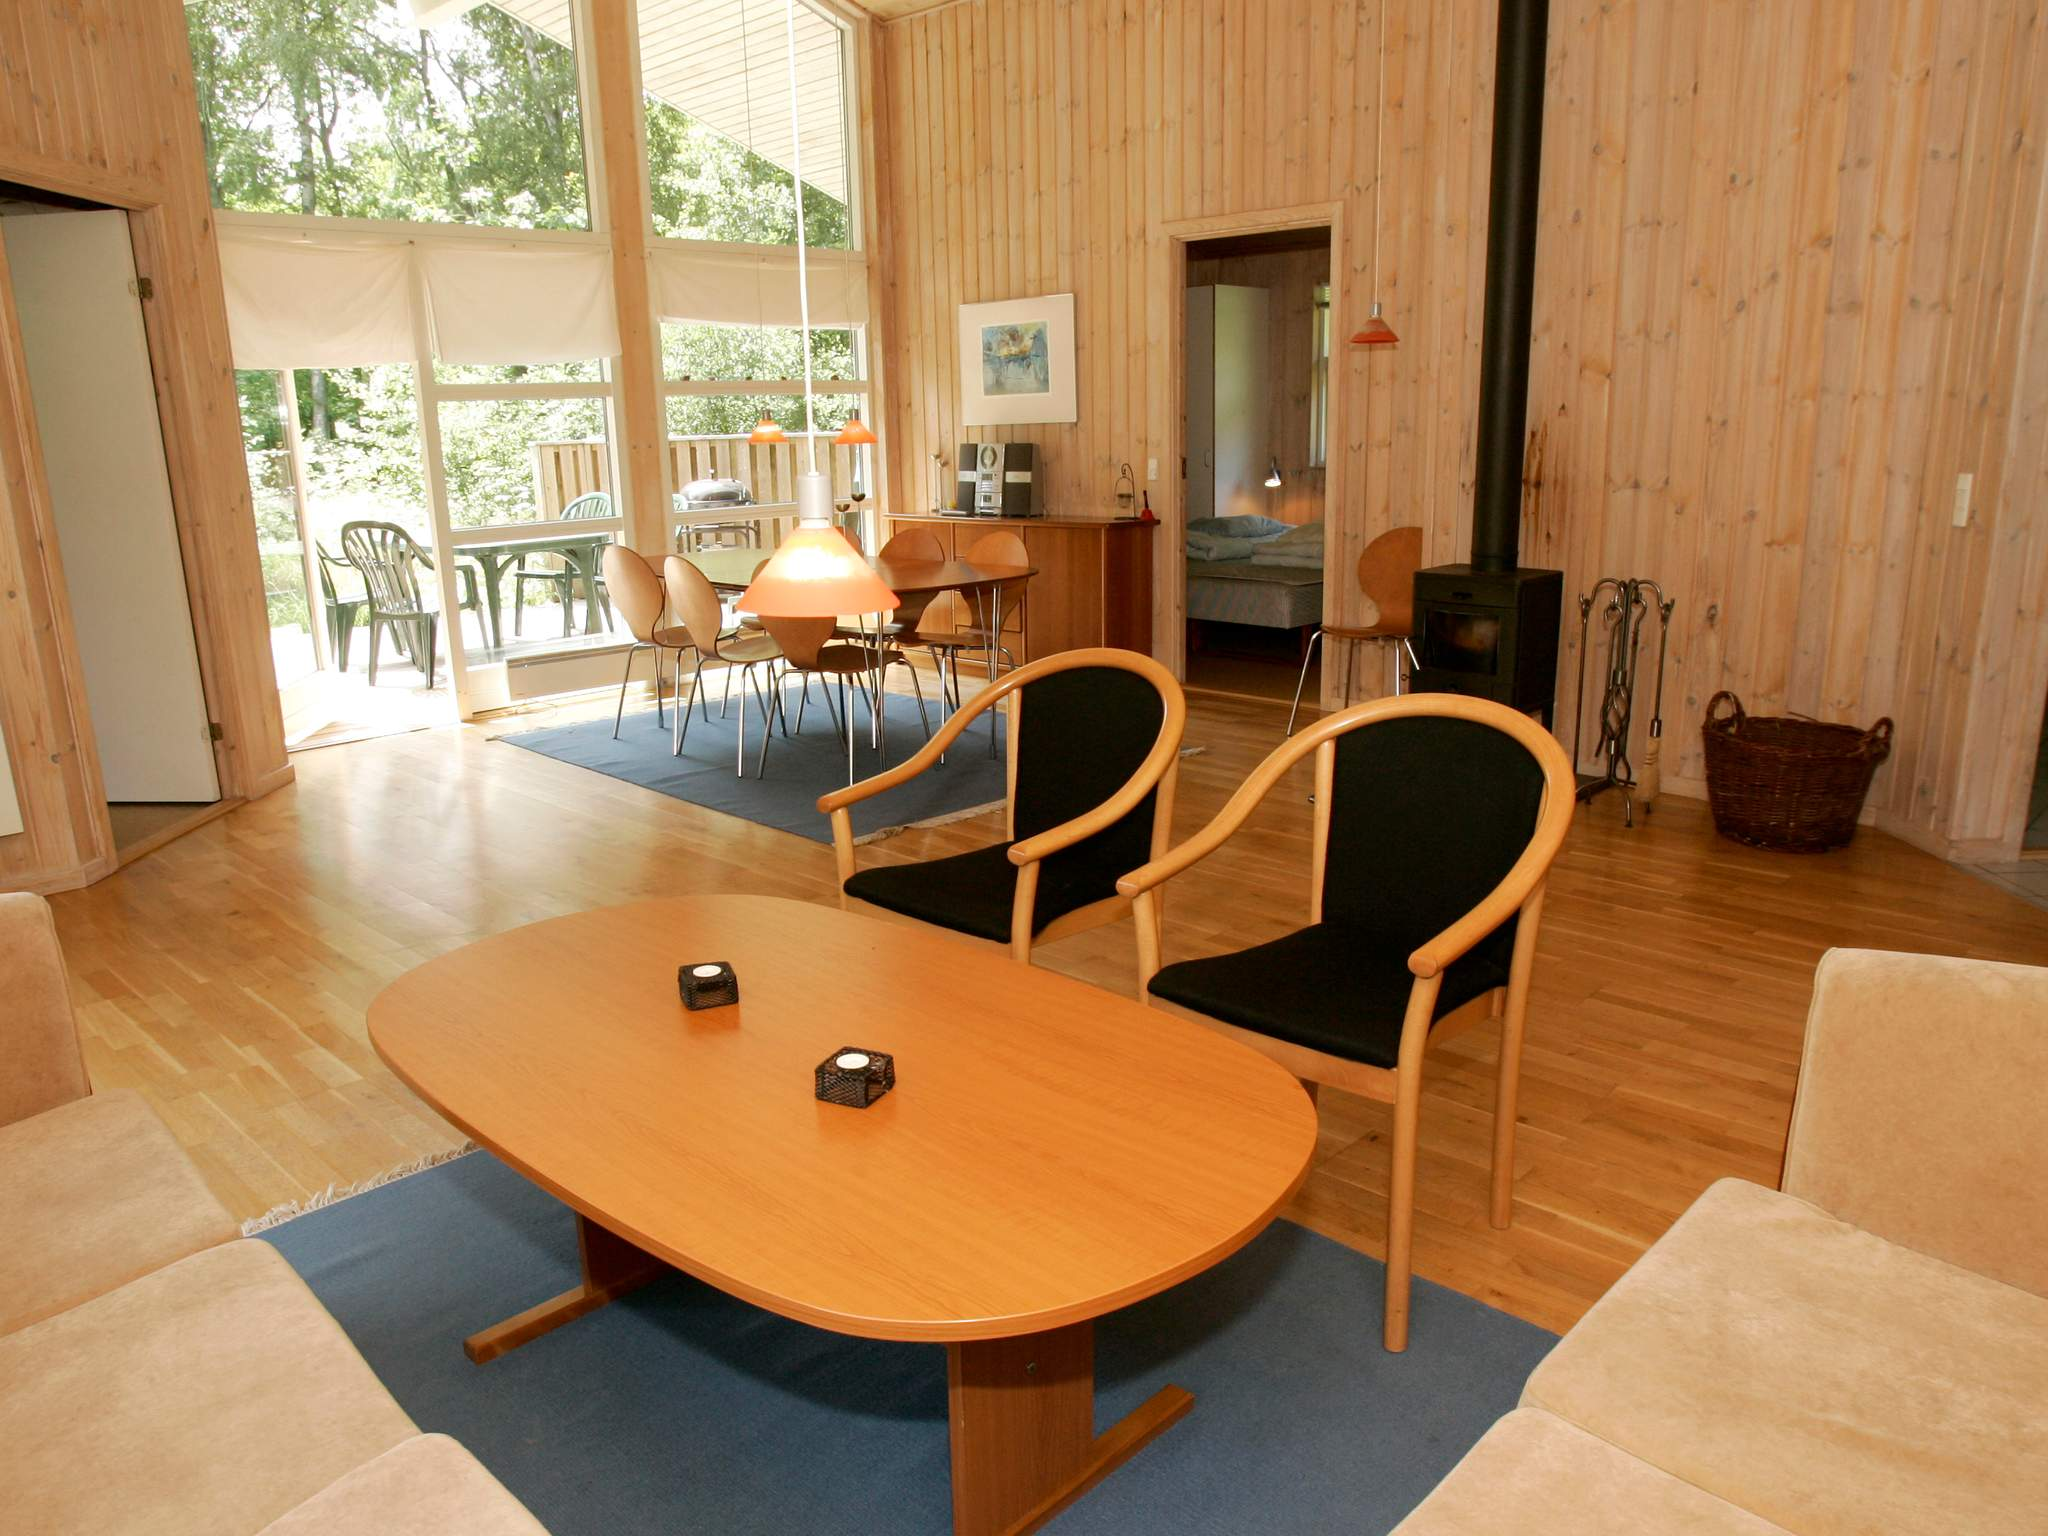 Ferienhaus Hasle (83419), Hasle, , Bornholm, Dänemark, Bild 5